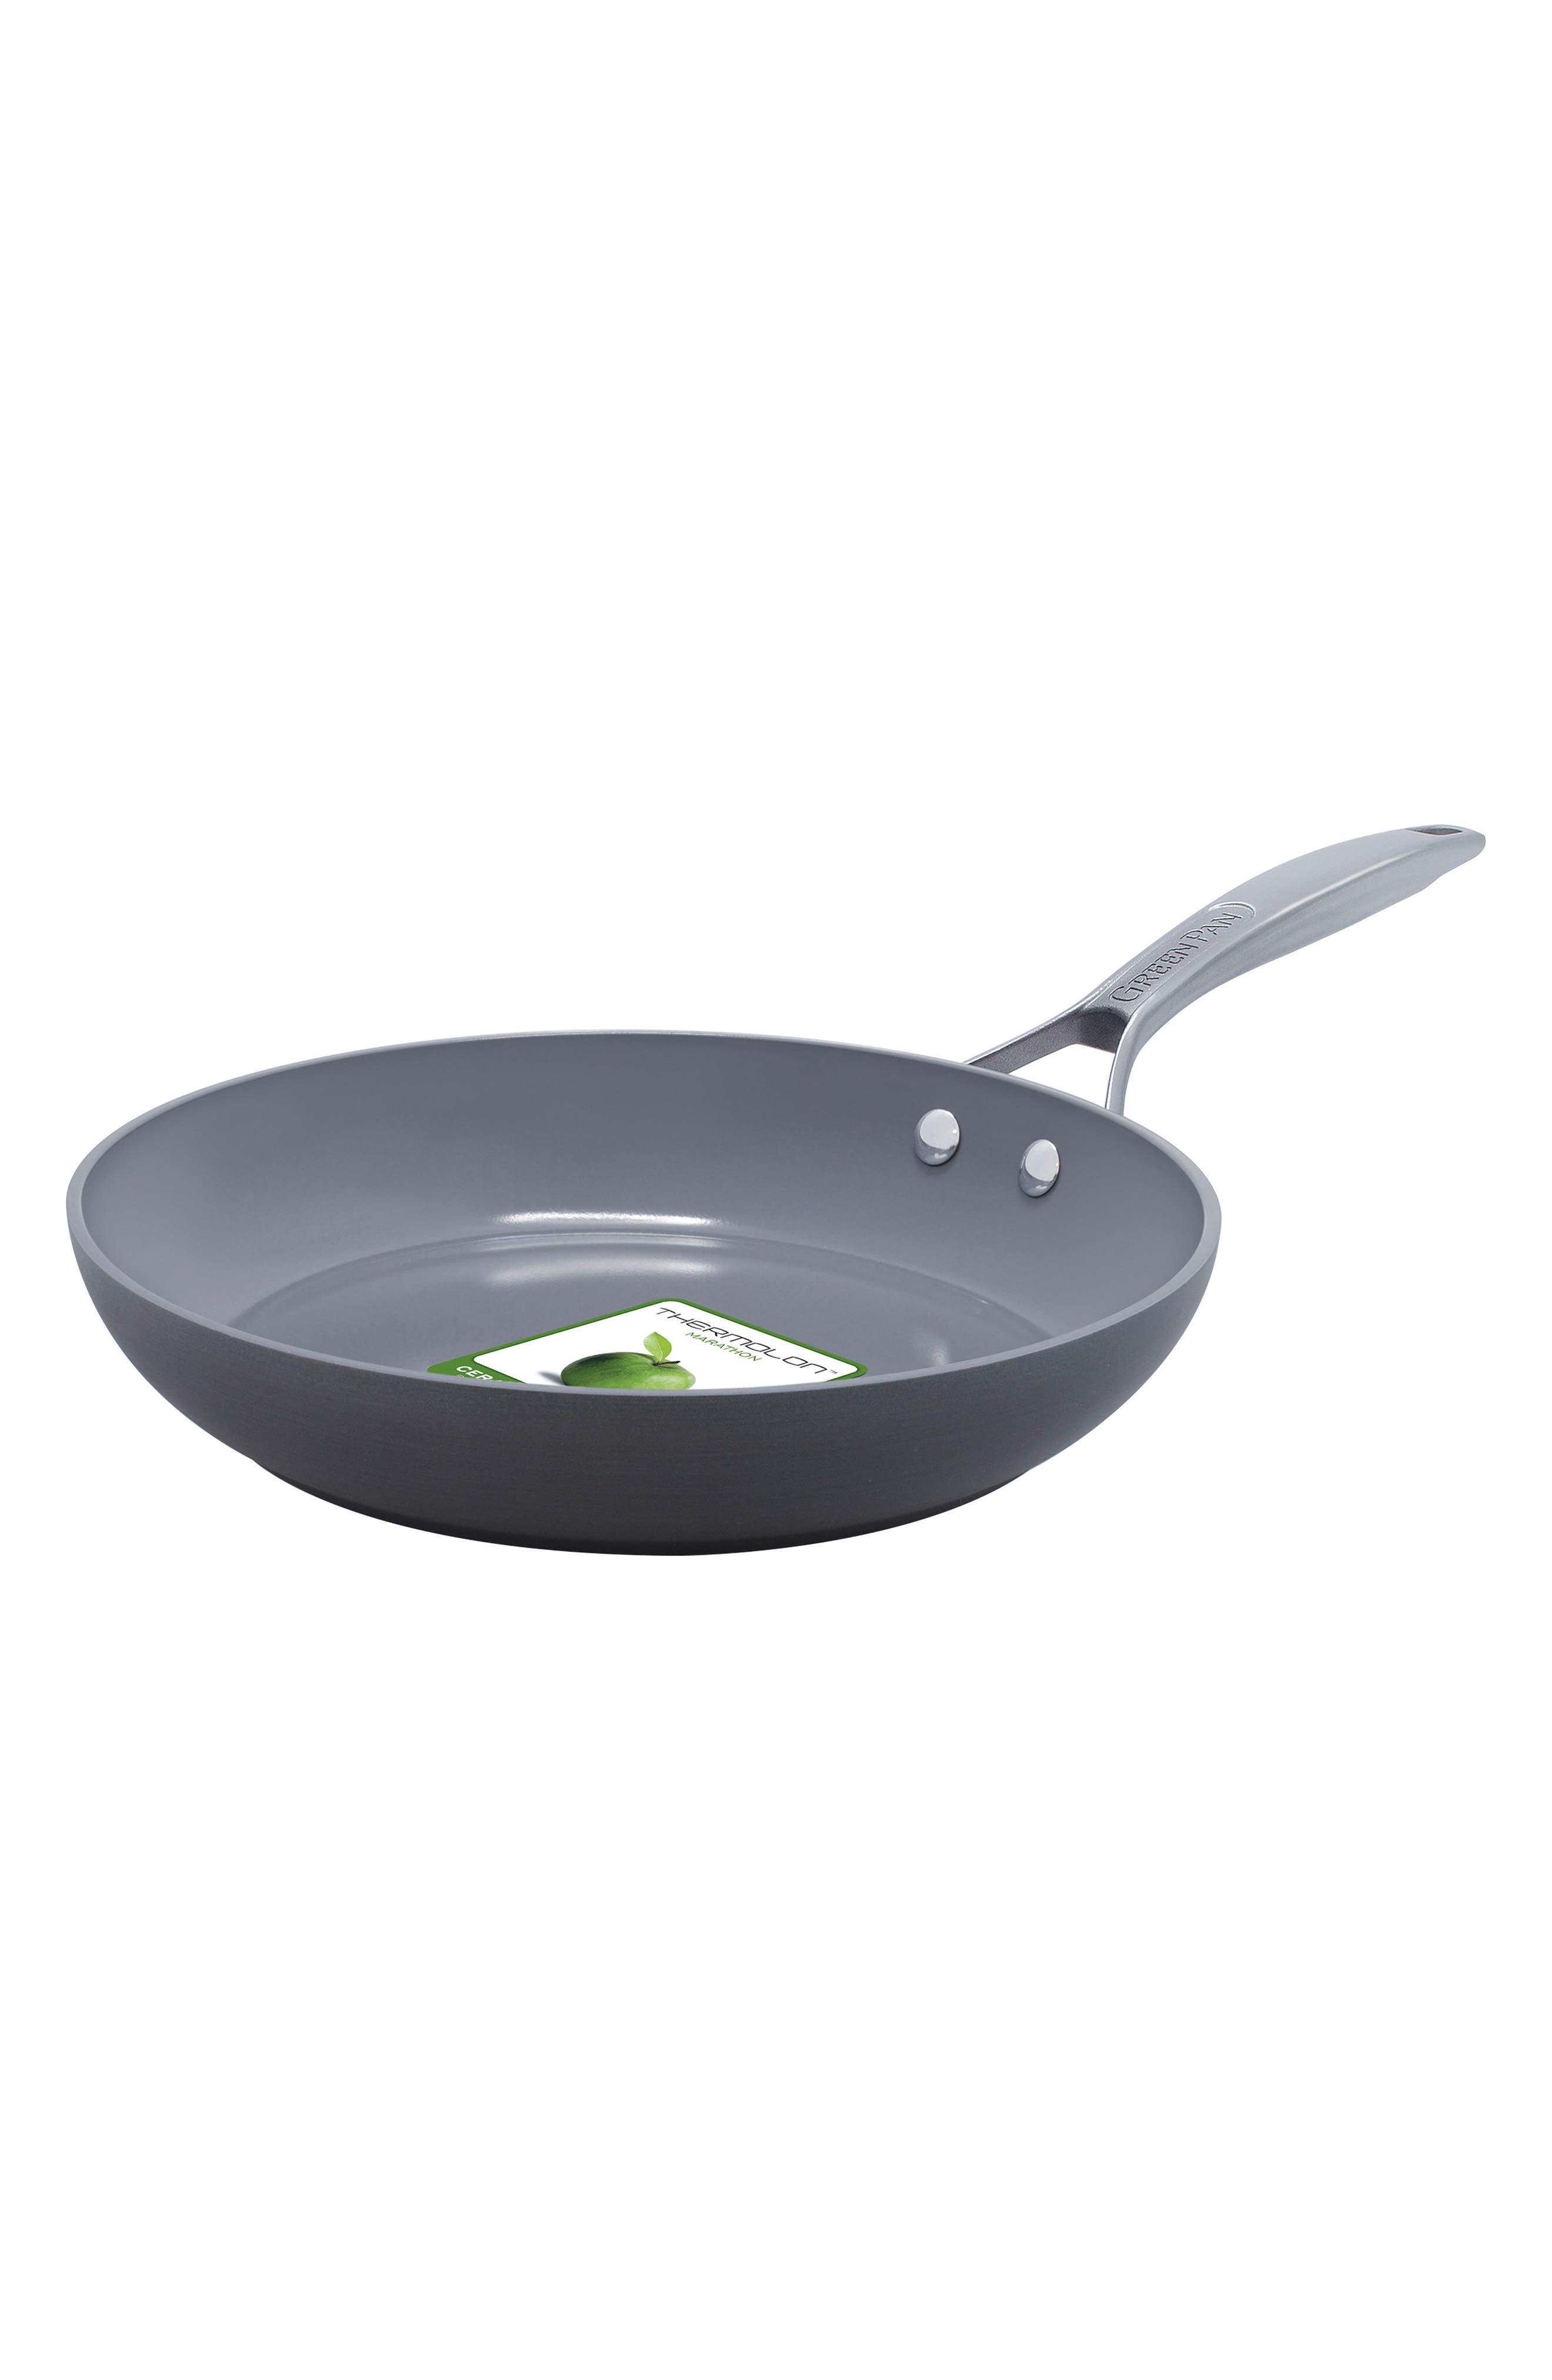 GreenPan Paris 10-Inch Anodized Aluminum Ceramic Nonstick Frying Pan